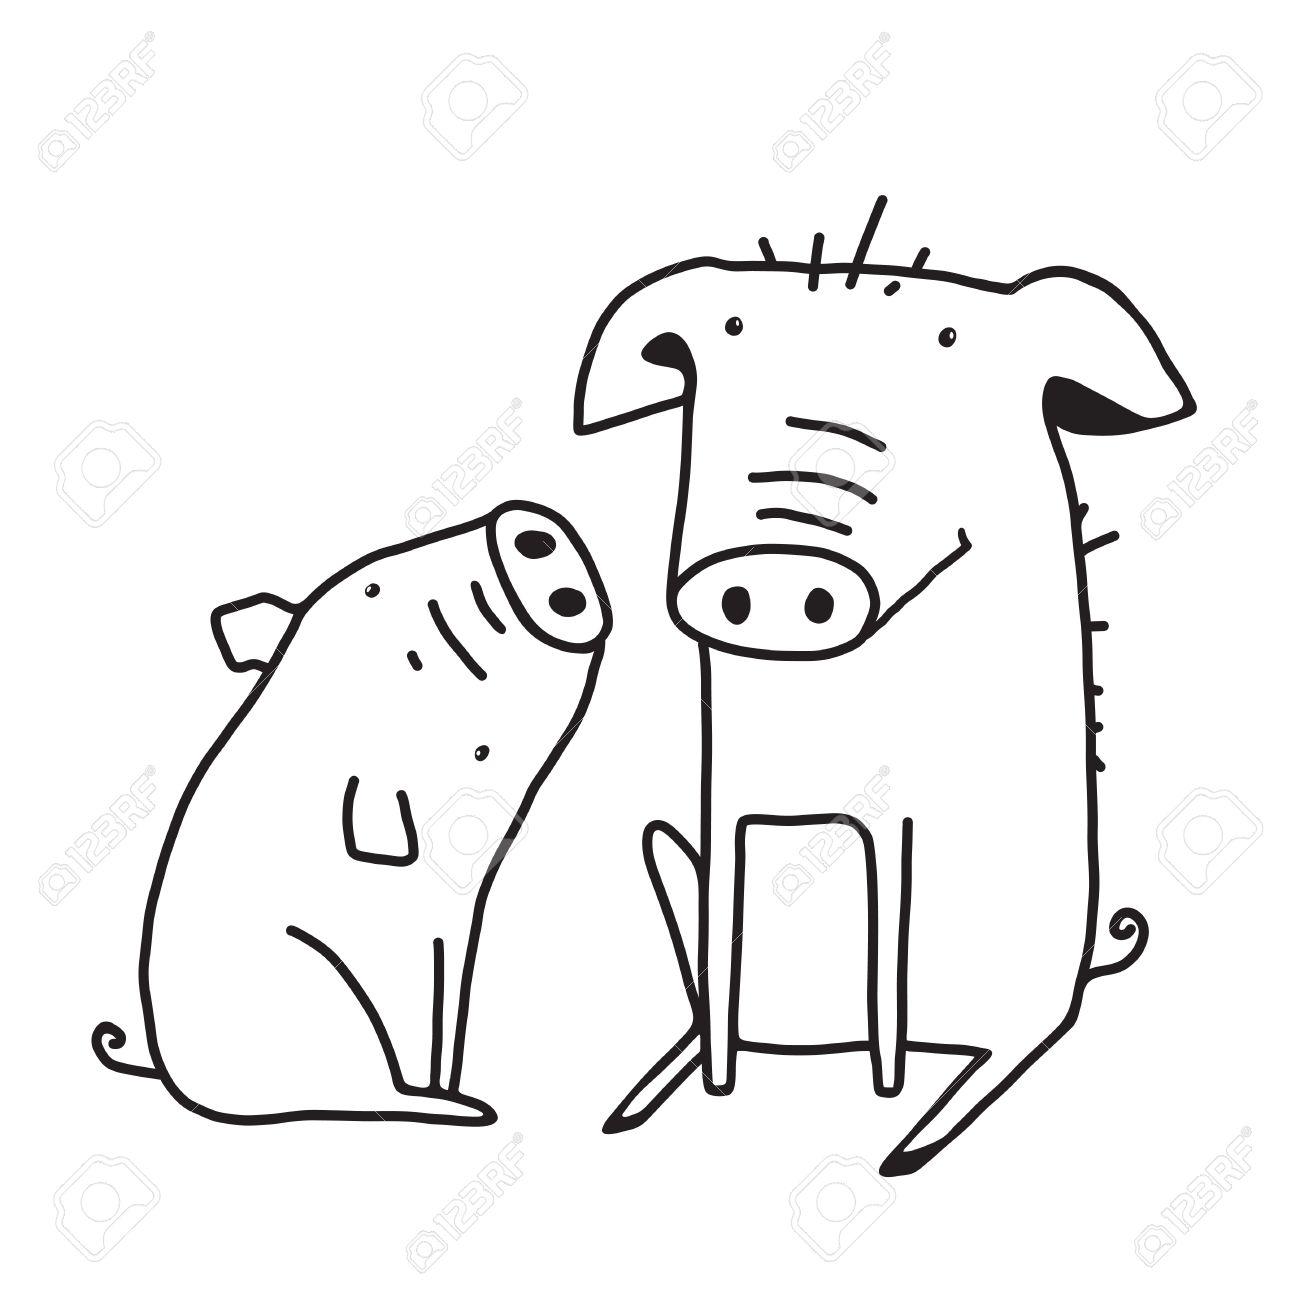 1300x1300 Farm Animals Line Drawing Illustration. Animal Farm Silhouette